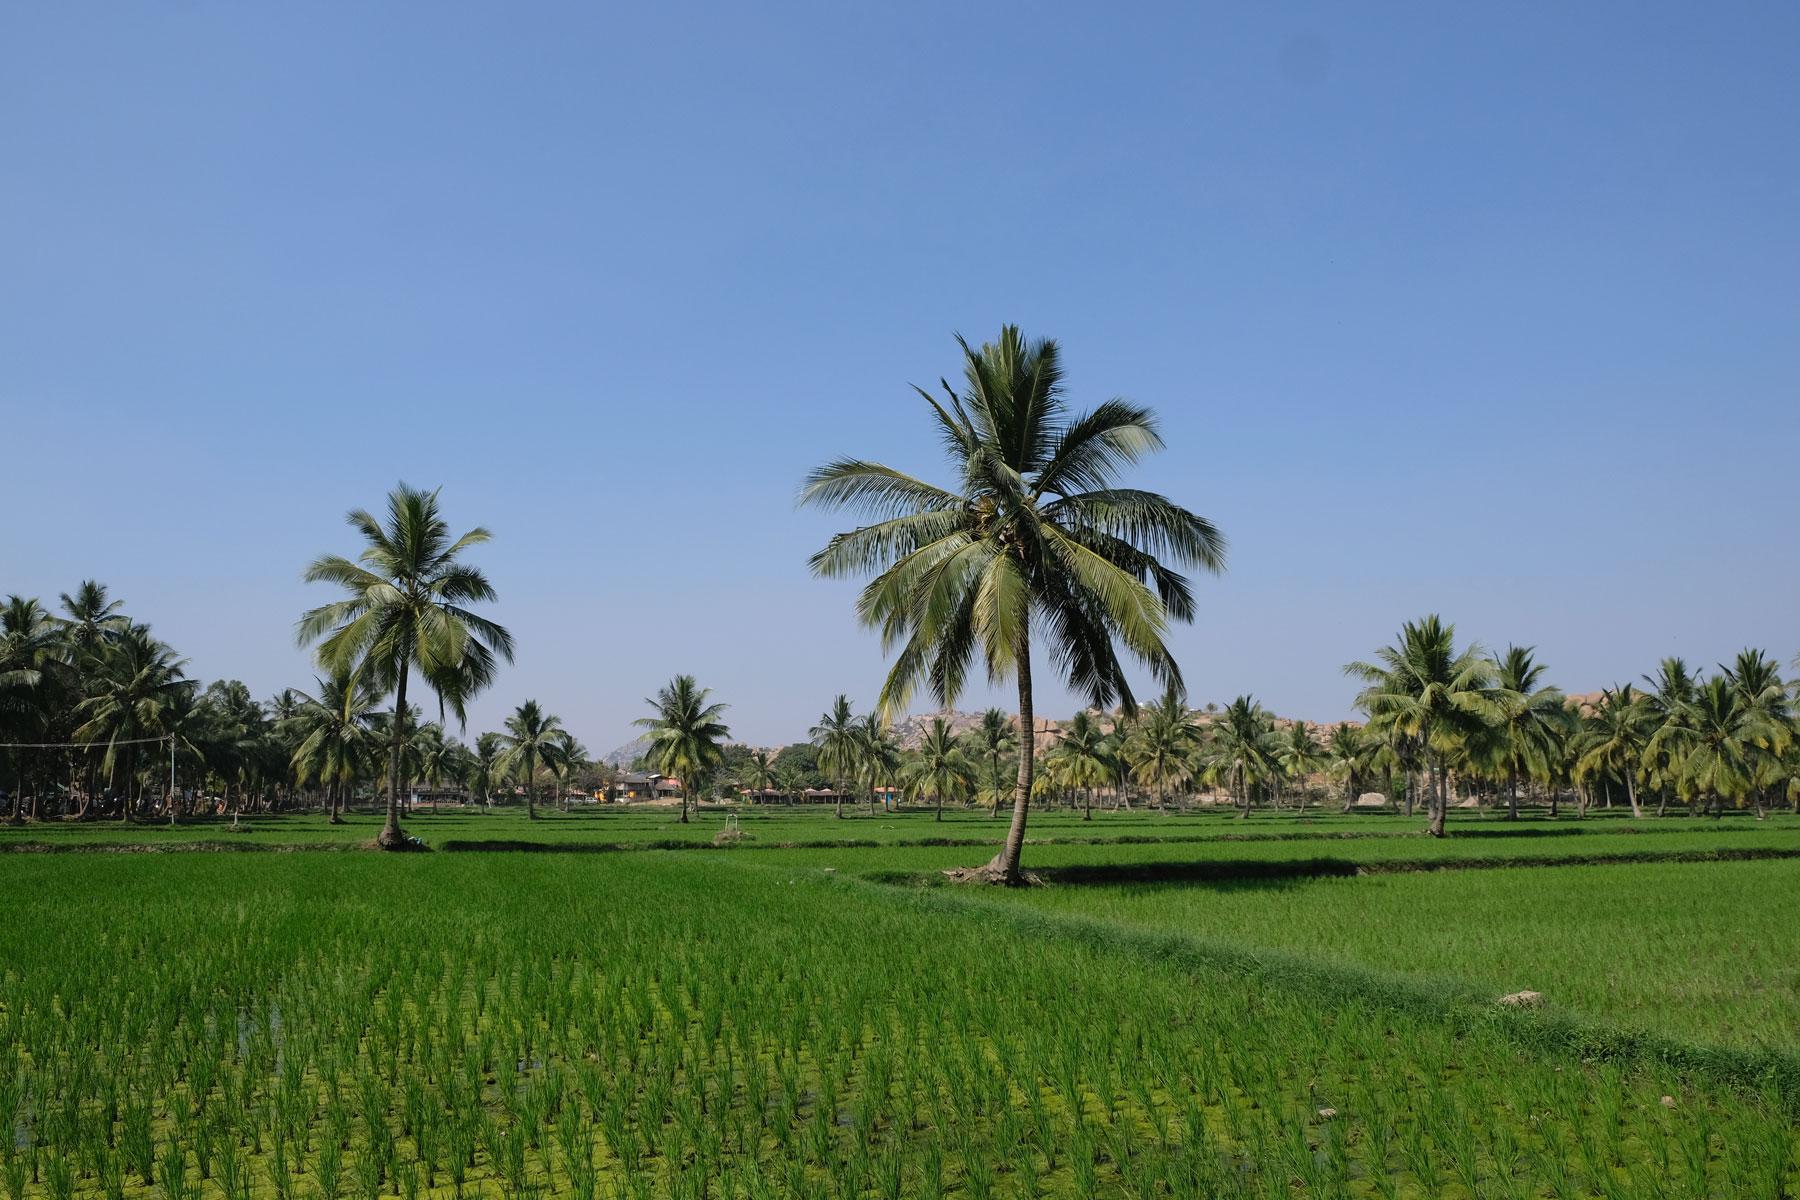 Reisfeld und Palmen in Hampi.